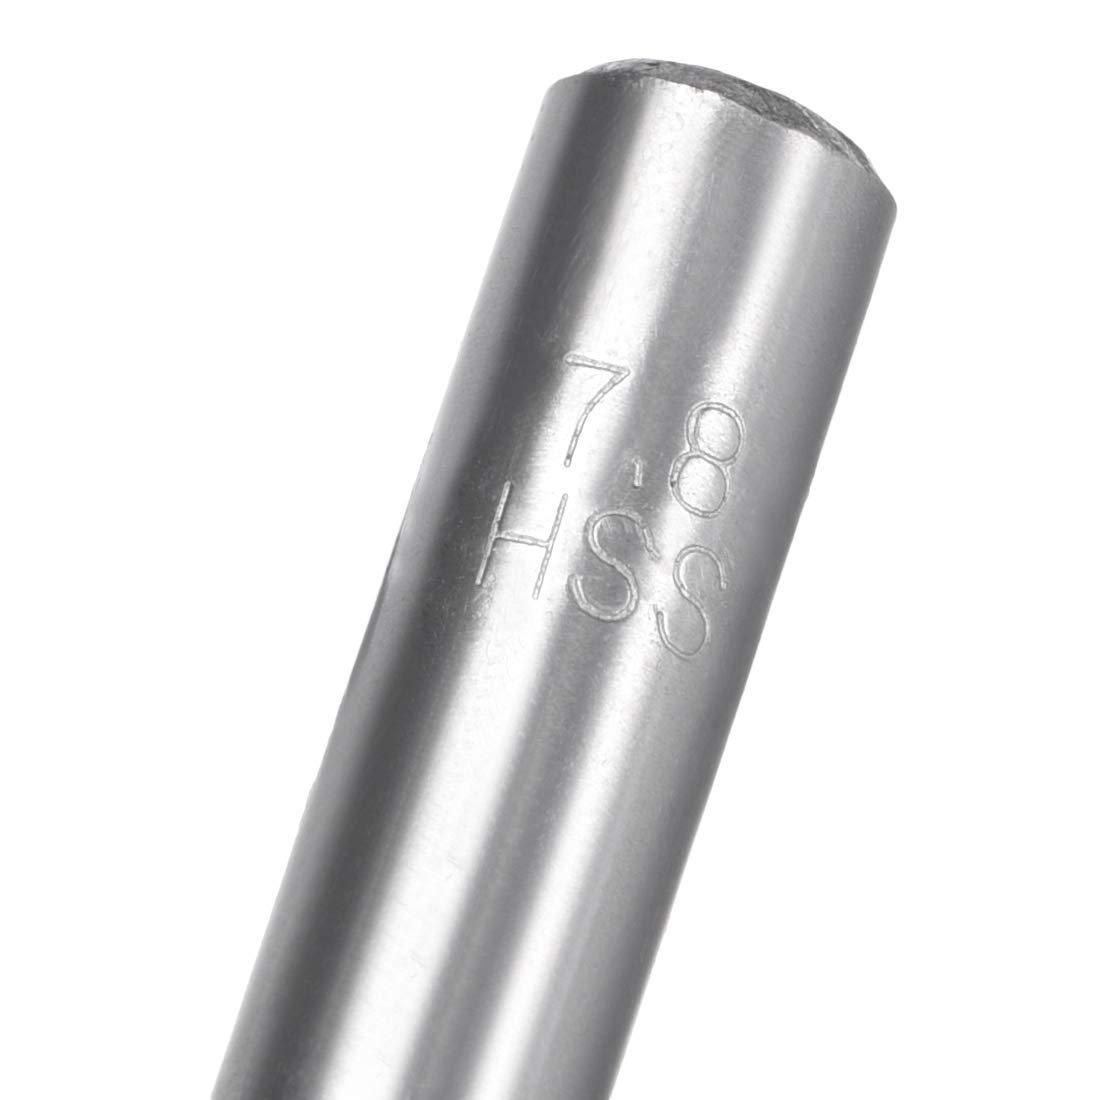 uxcell 8.8mm Twist Drill High Speed Steel Bit HSS-4241 for Steel,Aluminum Alloy 1pcs